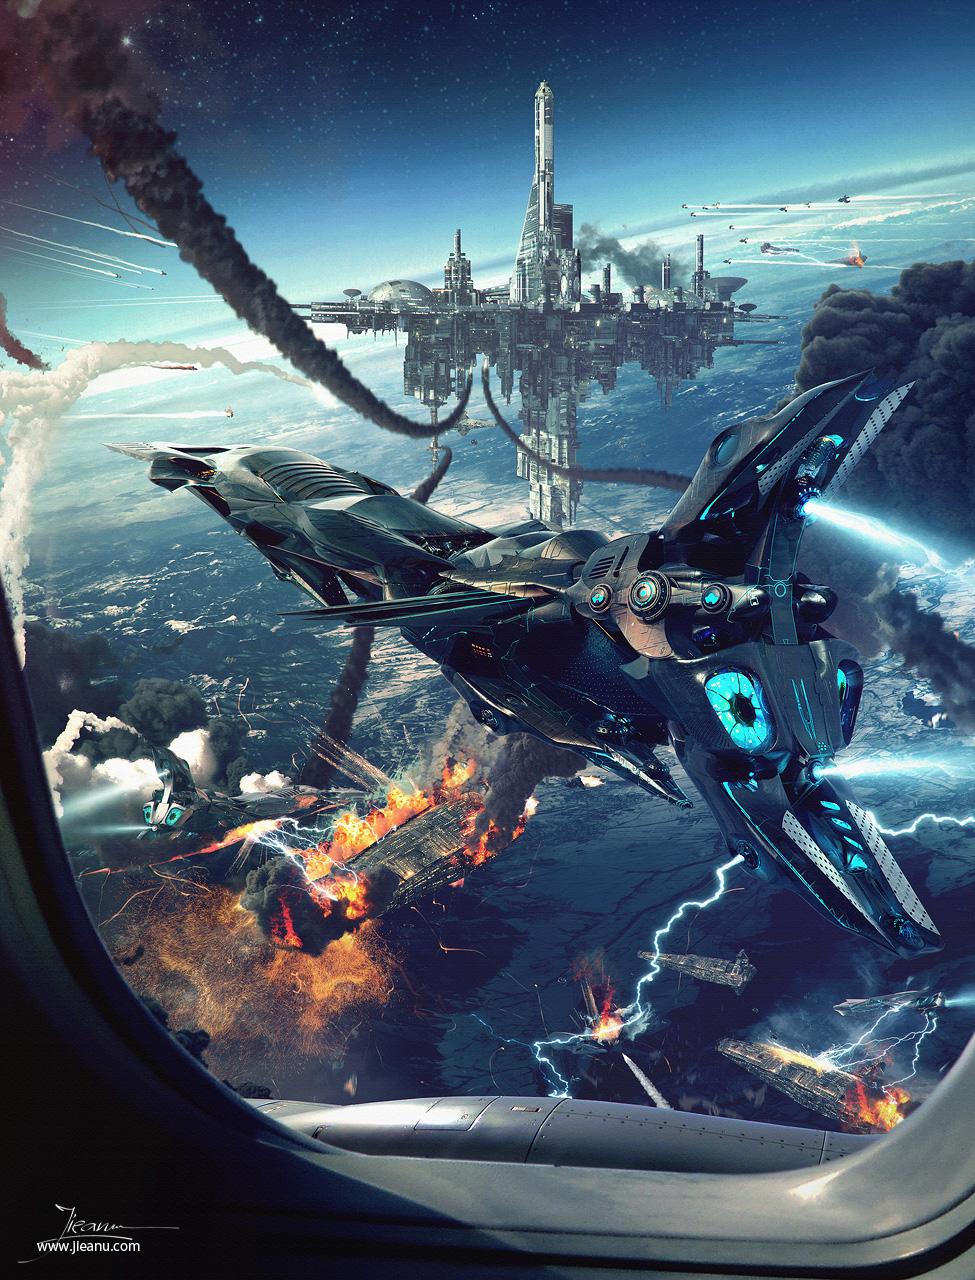 http://fc07.deviantart.net/fs71/f/2010/166/7/f/Battlefield_by_max4ever.jpg